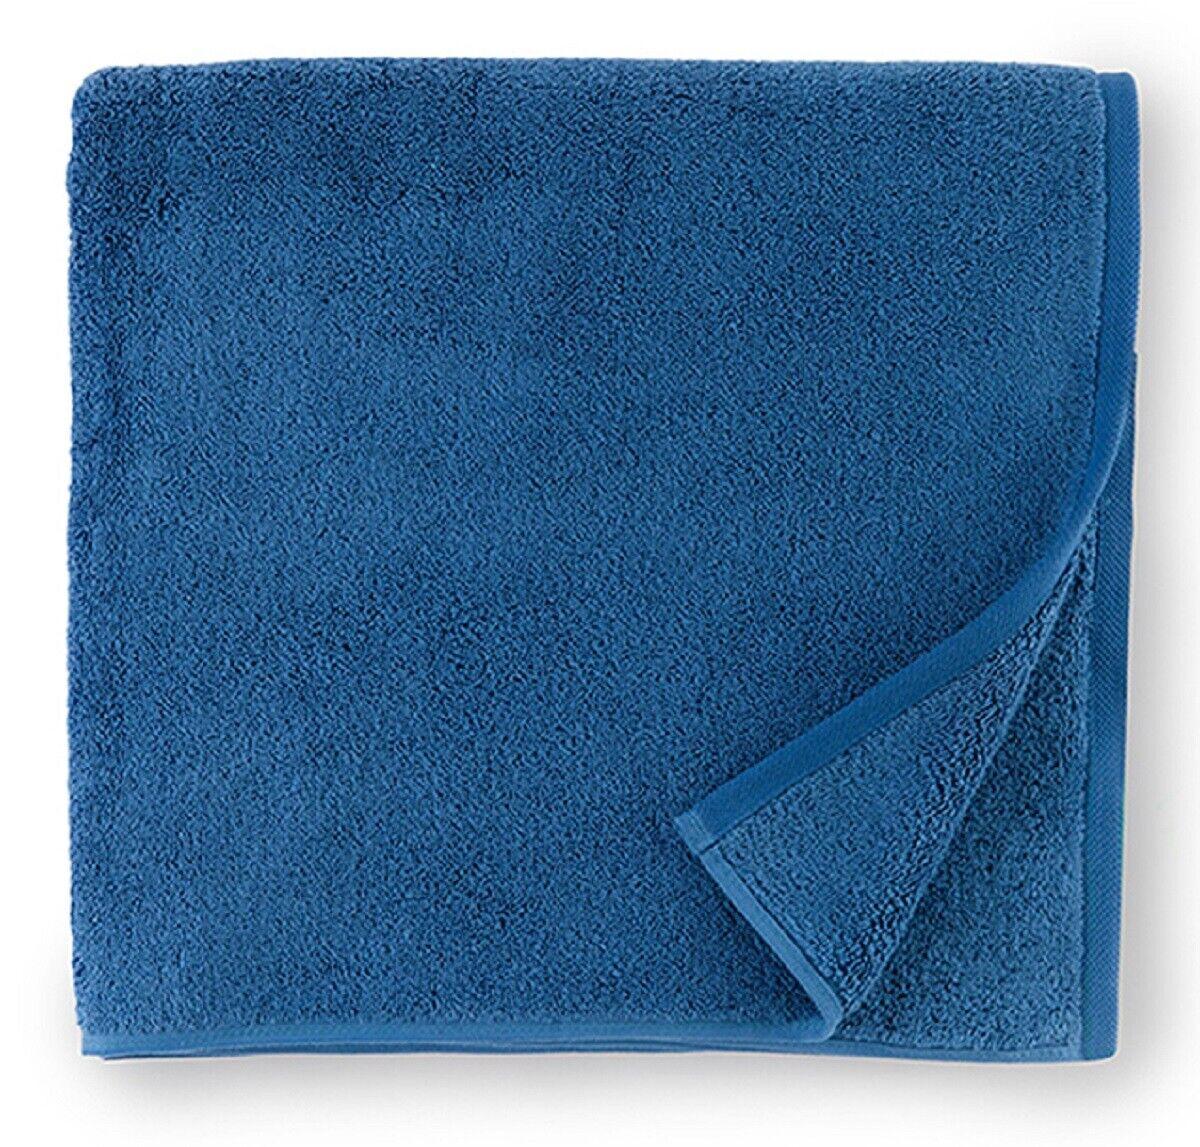 Sferra Sarma Fingertip Towel, Combed Turkish Cotton 12x20